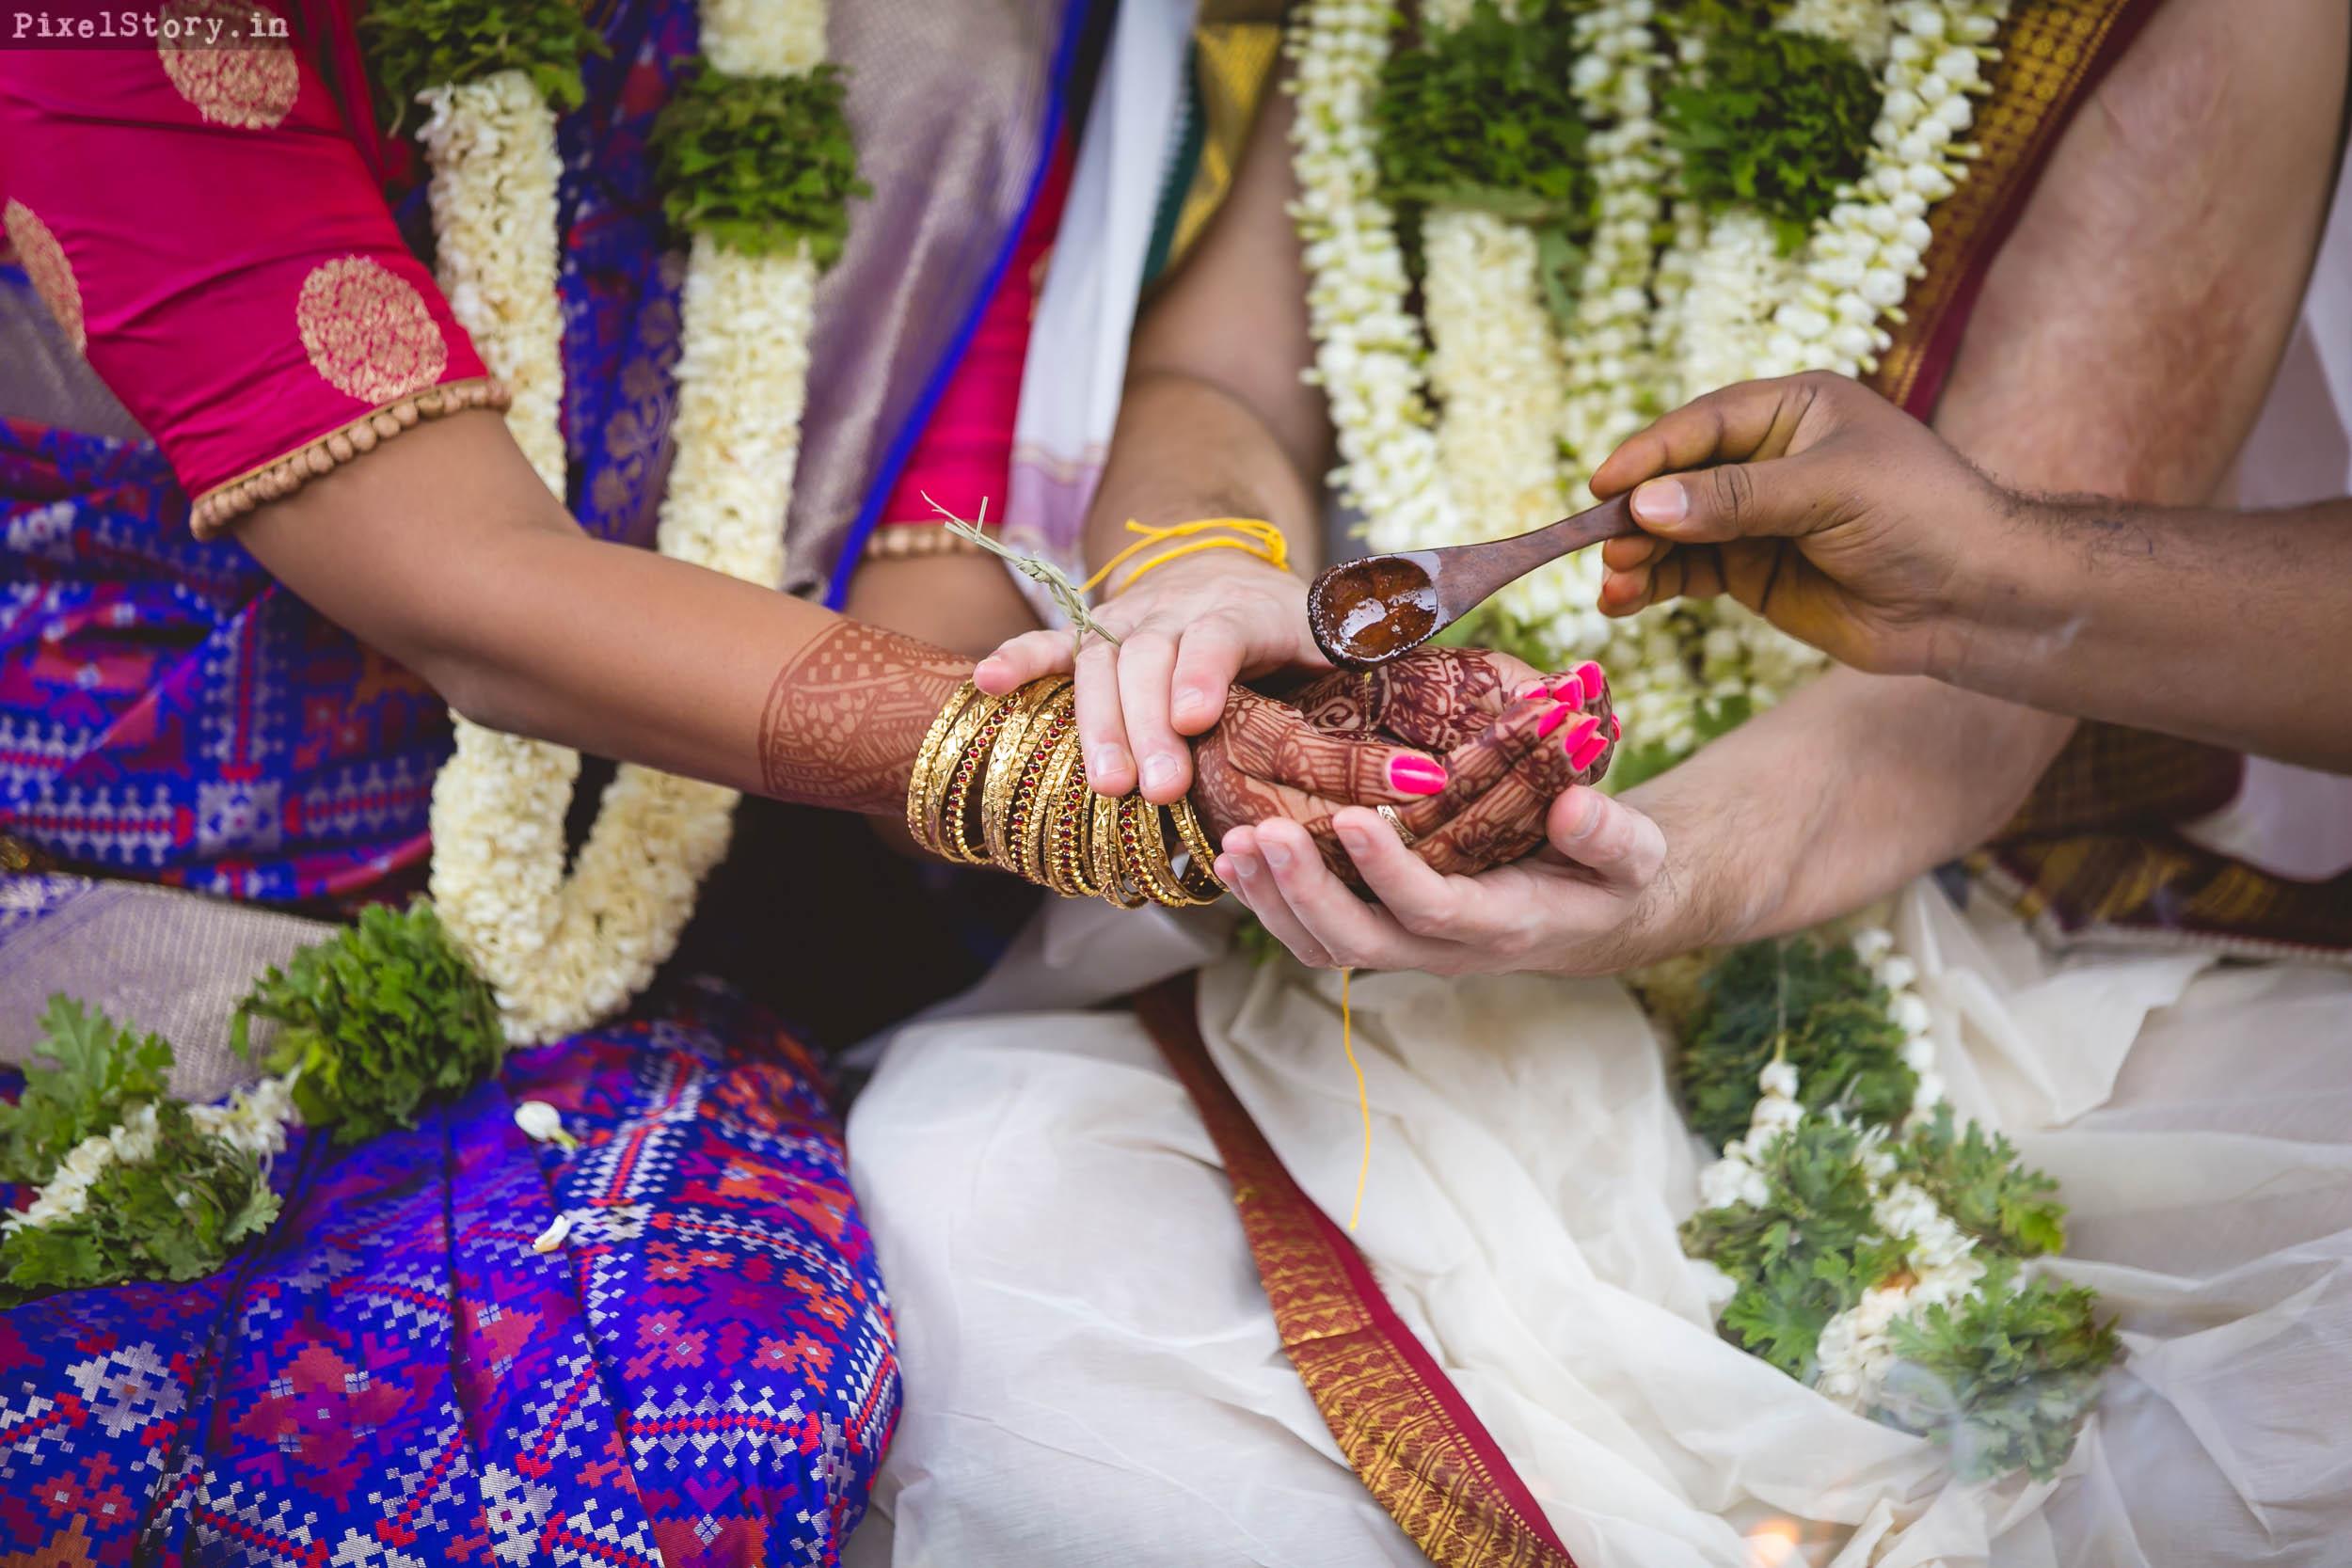 PixelStory-Jungle-Wedding-Photographer-Masinagudi-Indo-French074.jpg